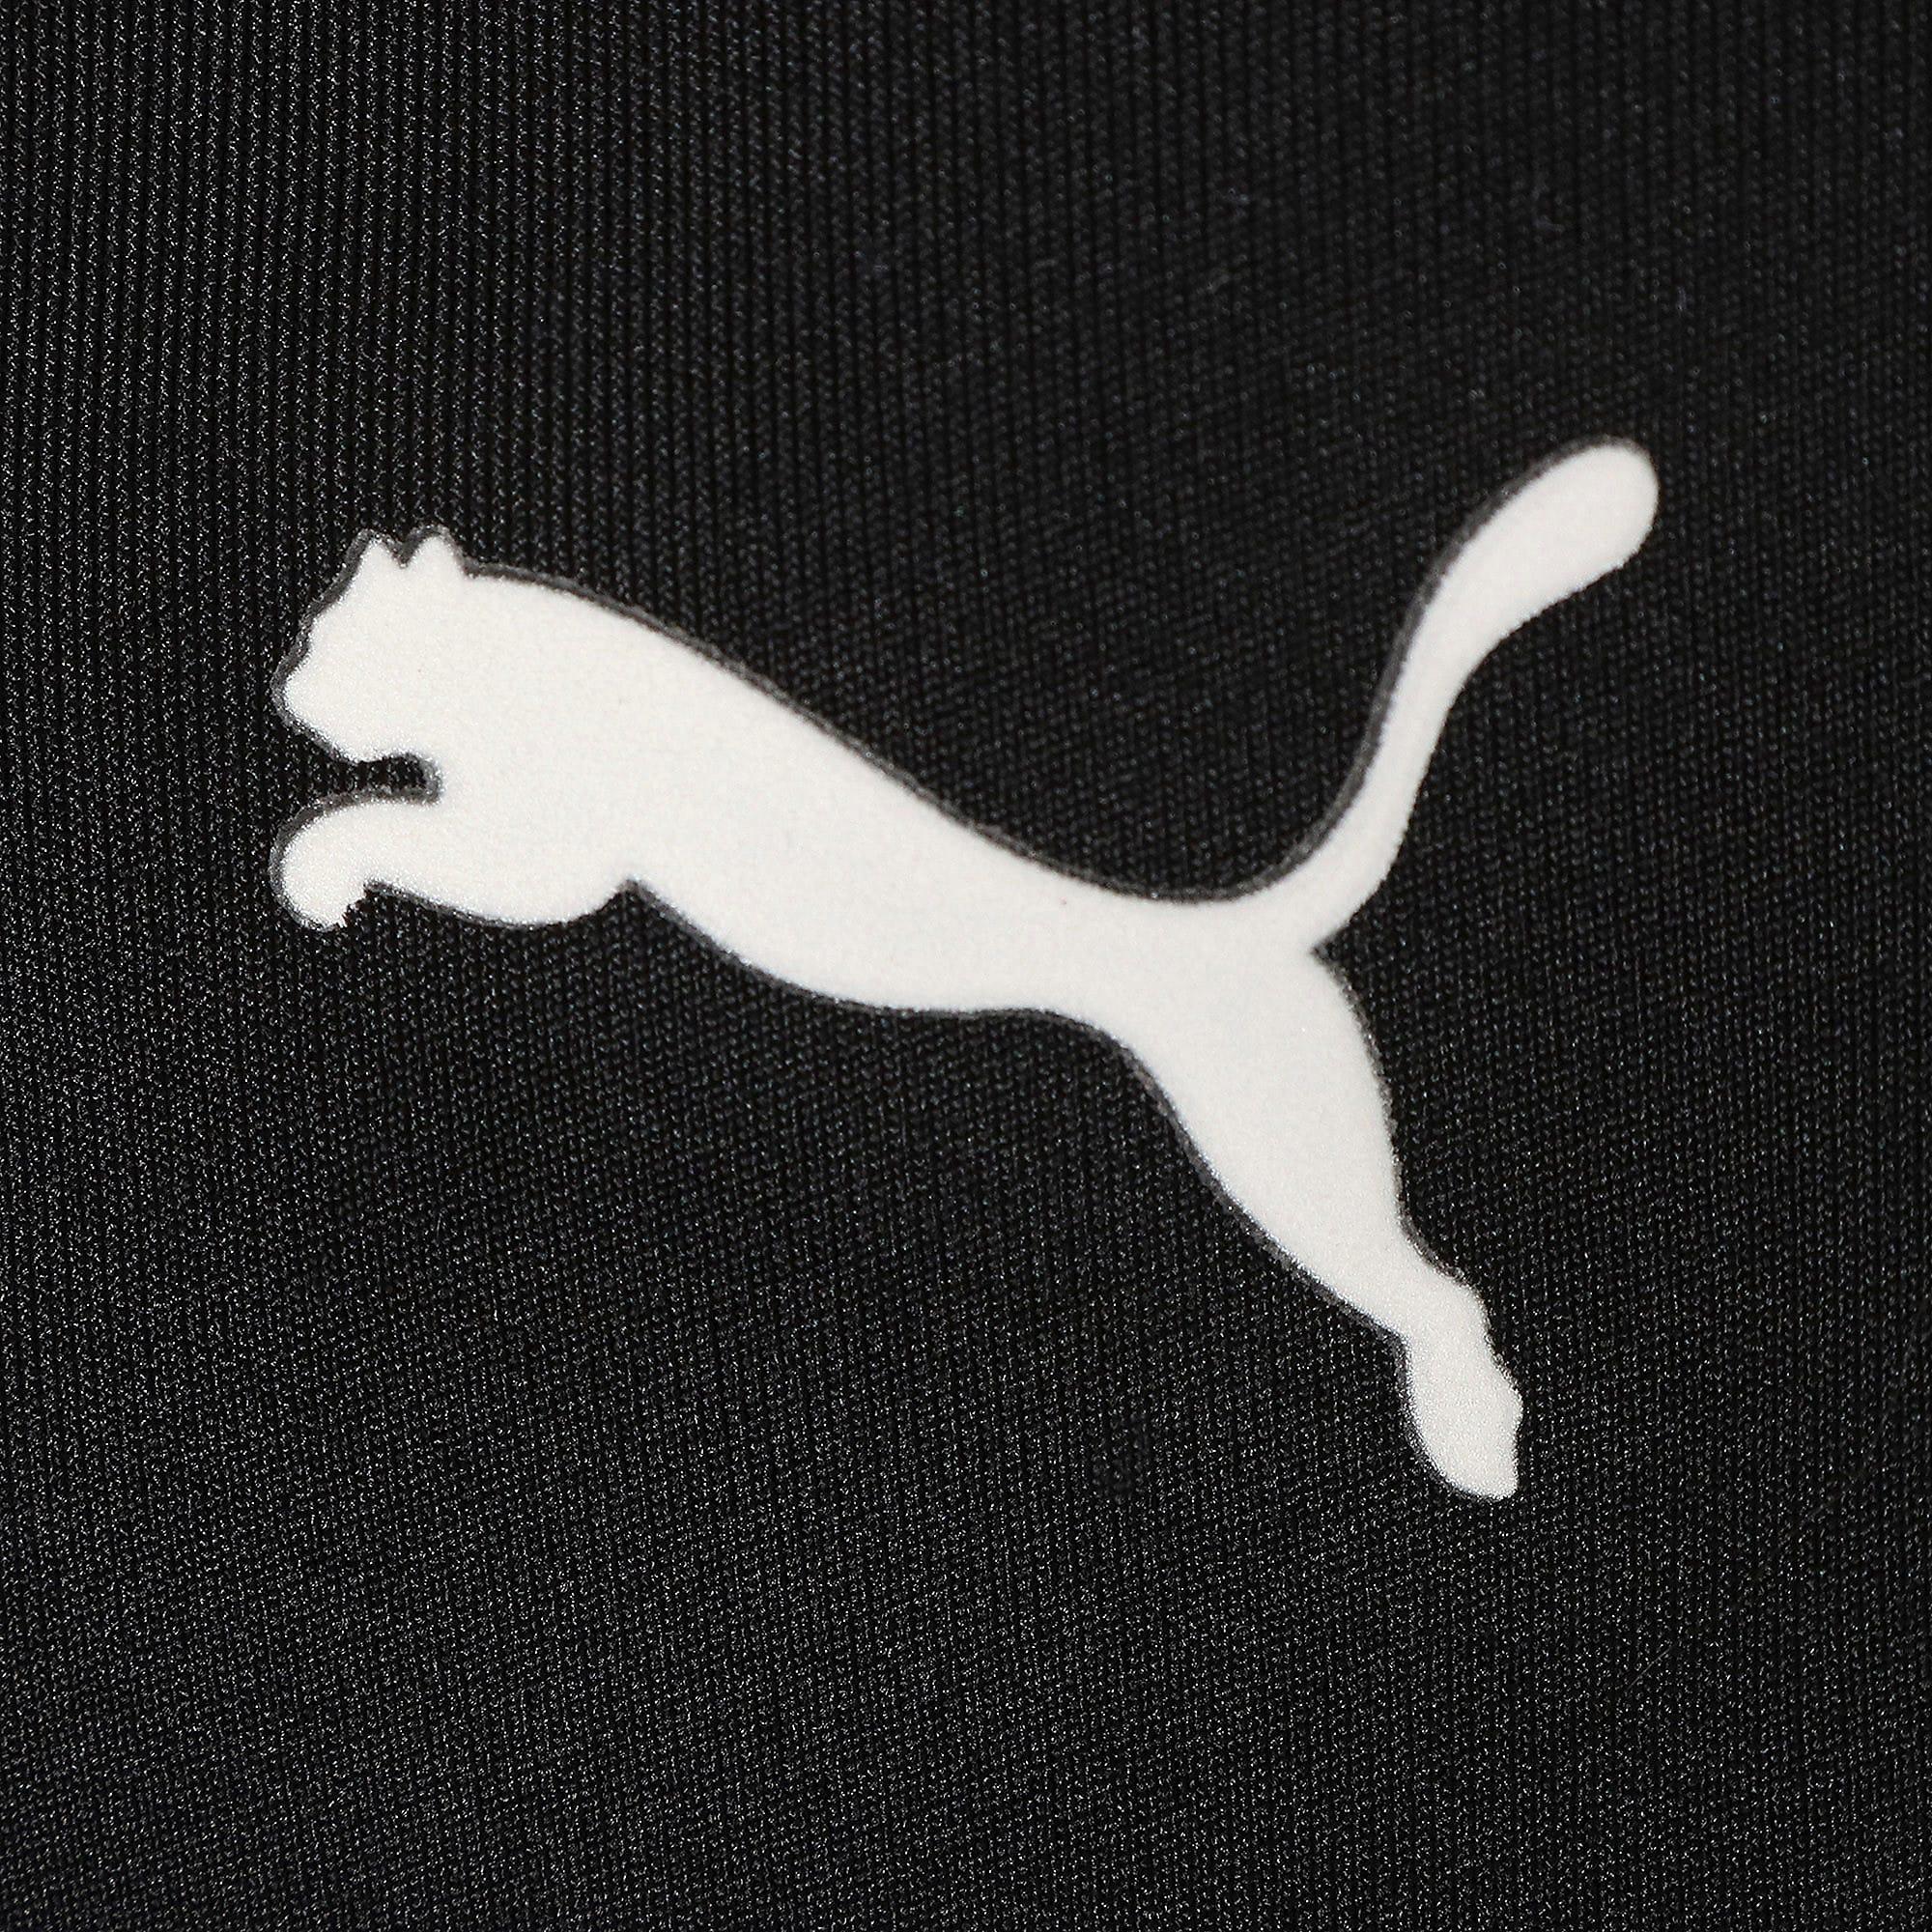 Thumbnail 7 of SG x PUMA ウィメンズ クロップド トップ, Puma Black-Puma Black, medium-JPN